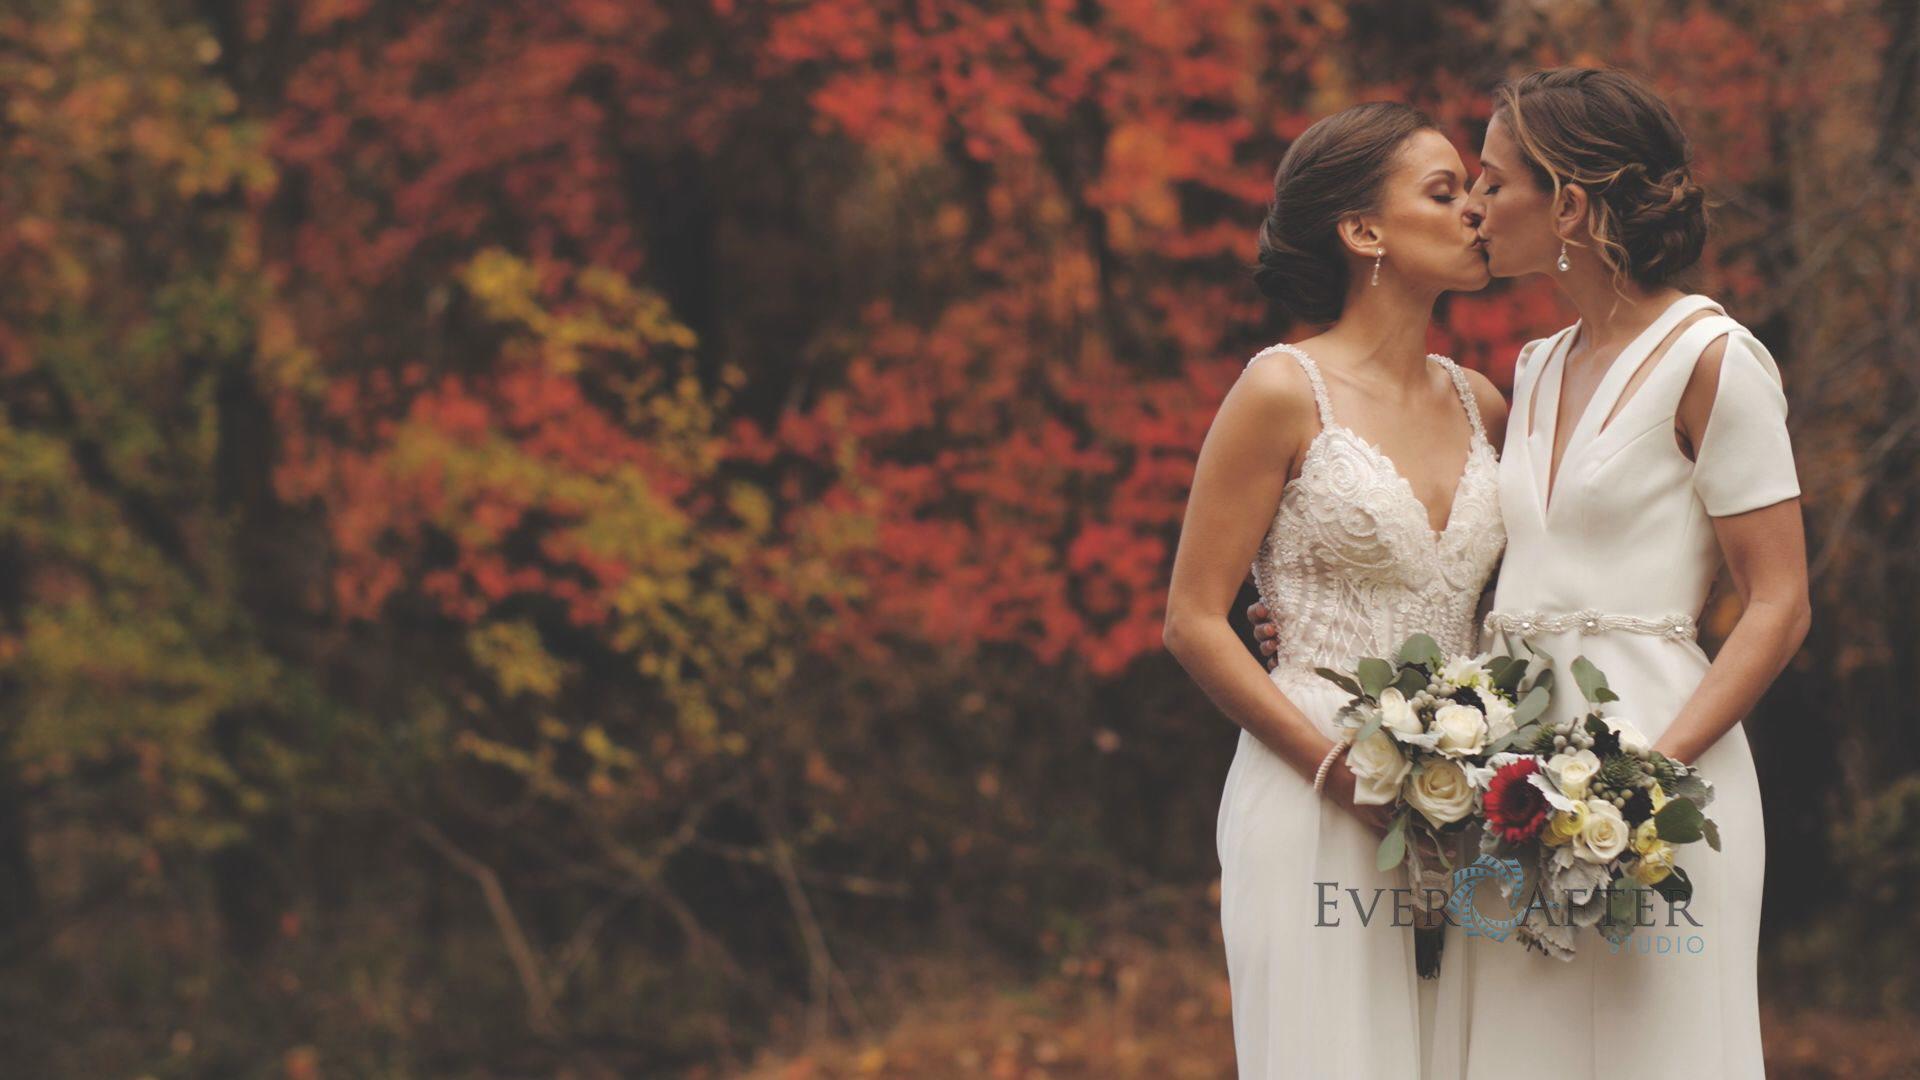 Jennifer + Vikki | Garwood, New Jersey | The Westwood